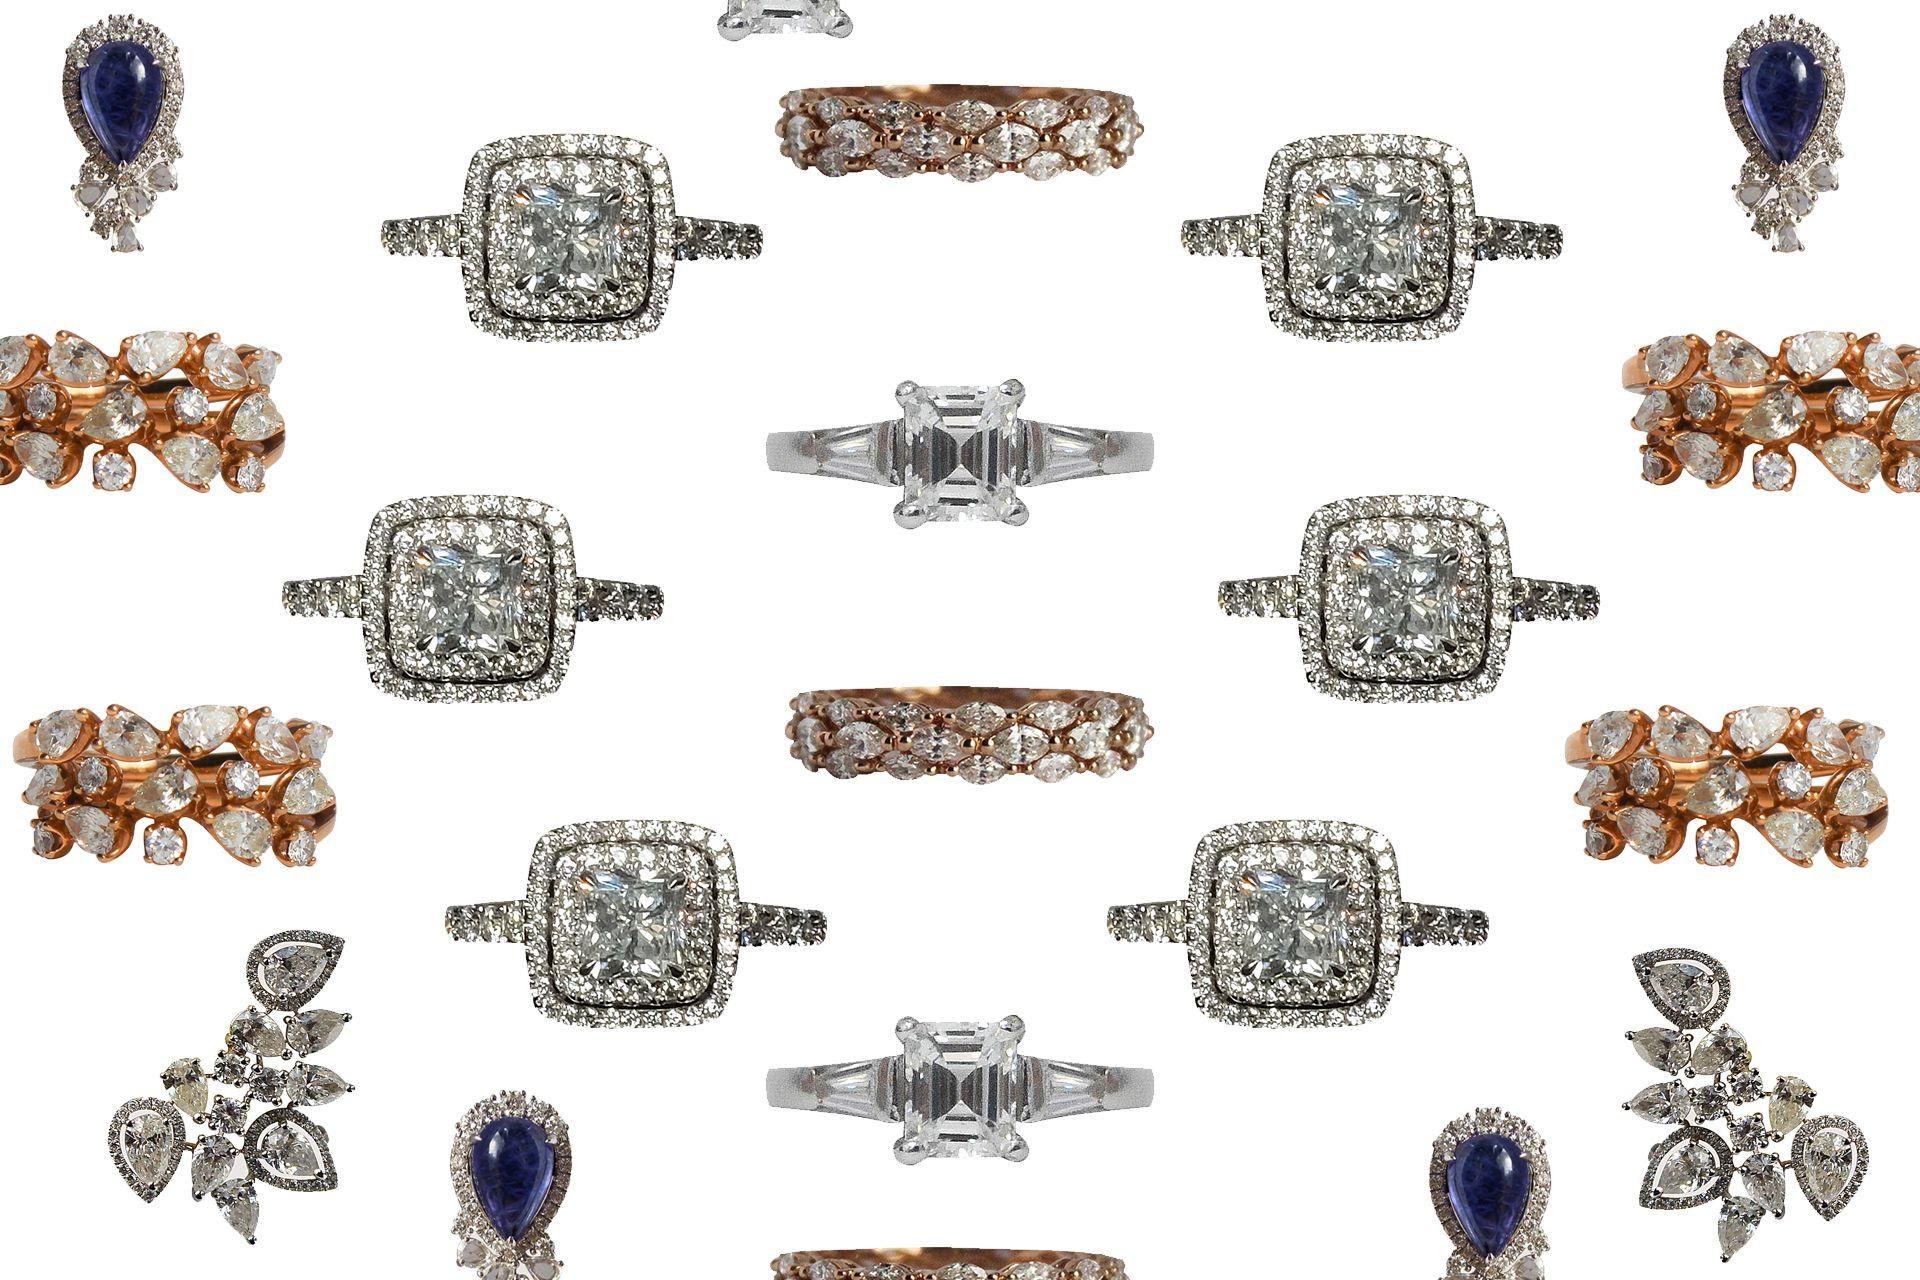 Should Your Engagement Ring and Wedding Band Be Custom? We Ask Nicole Whisenhunt